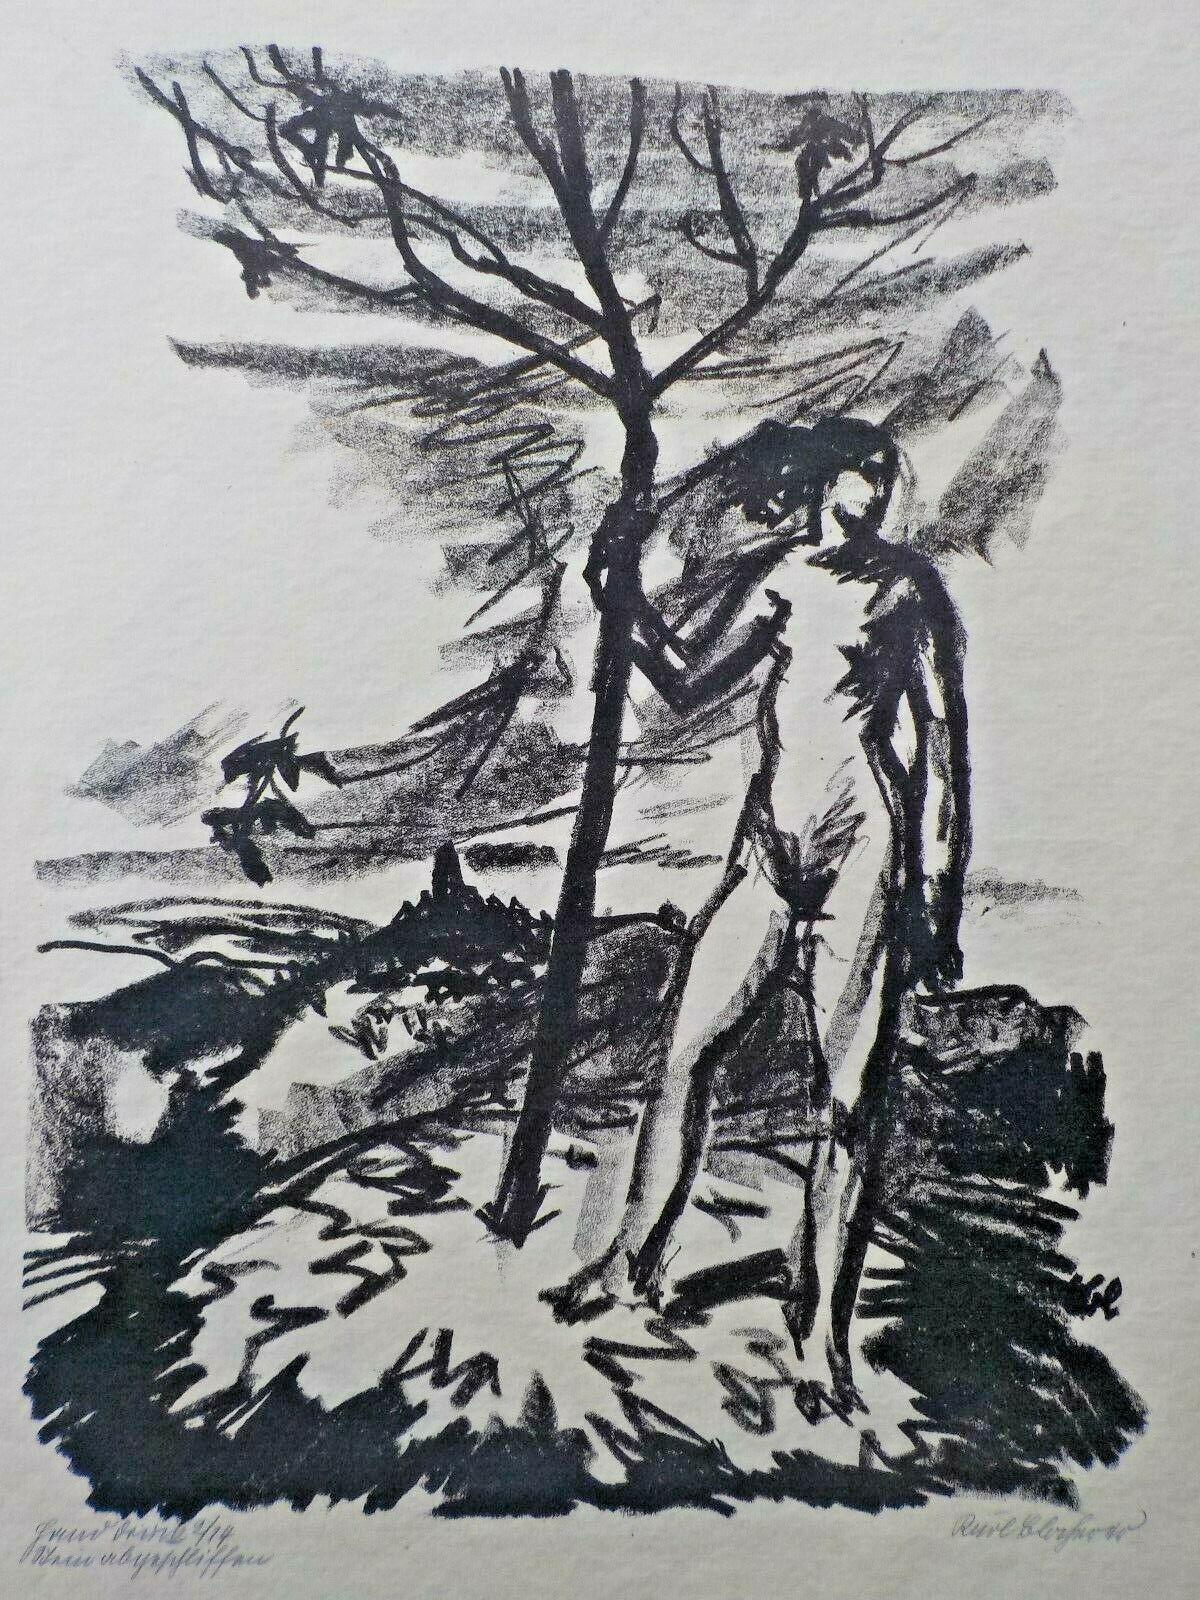 Untitled by Karl Blocherer